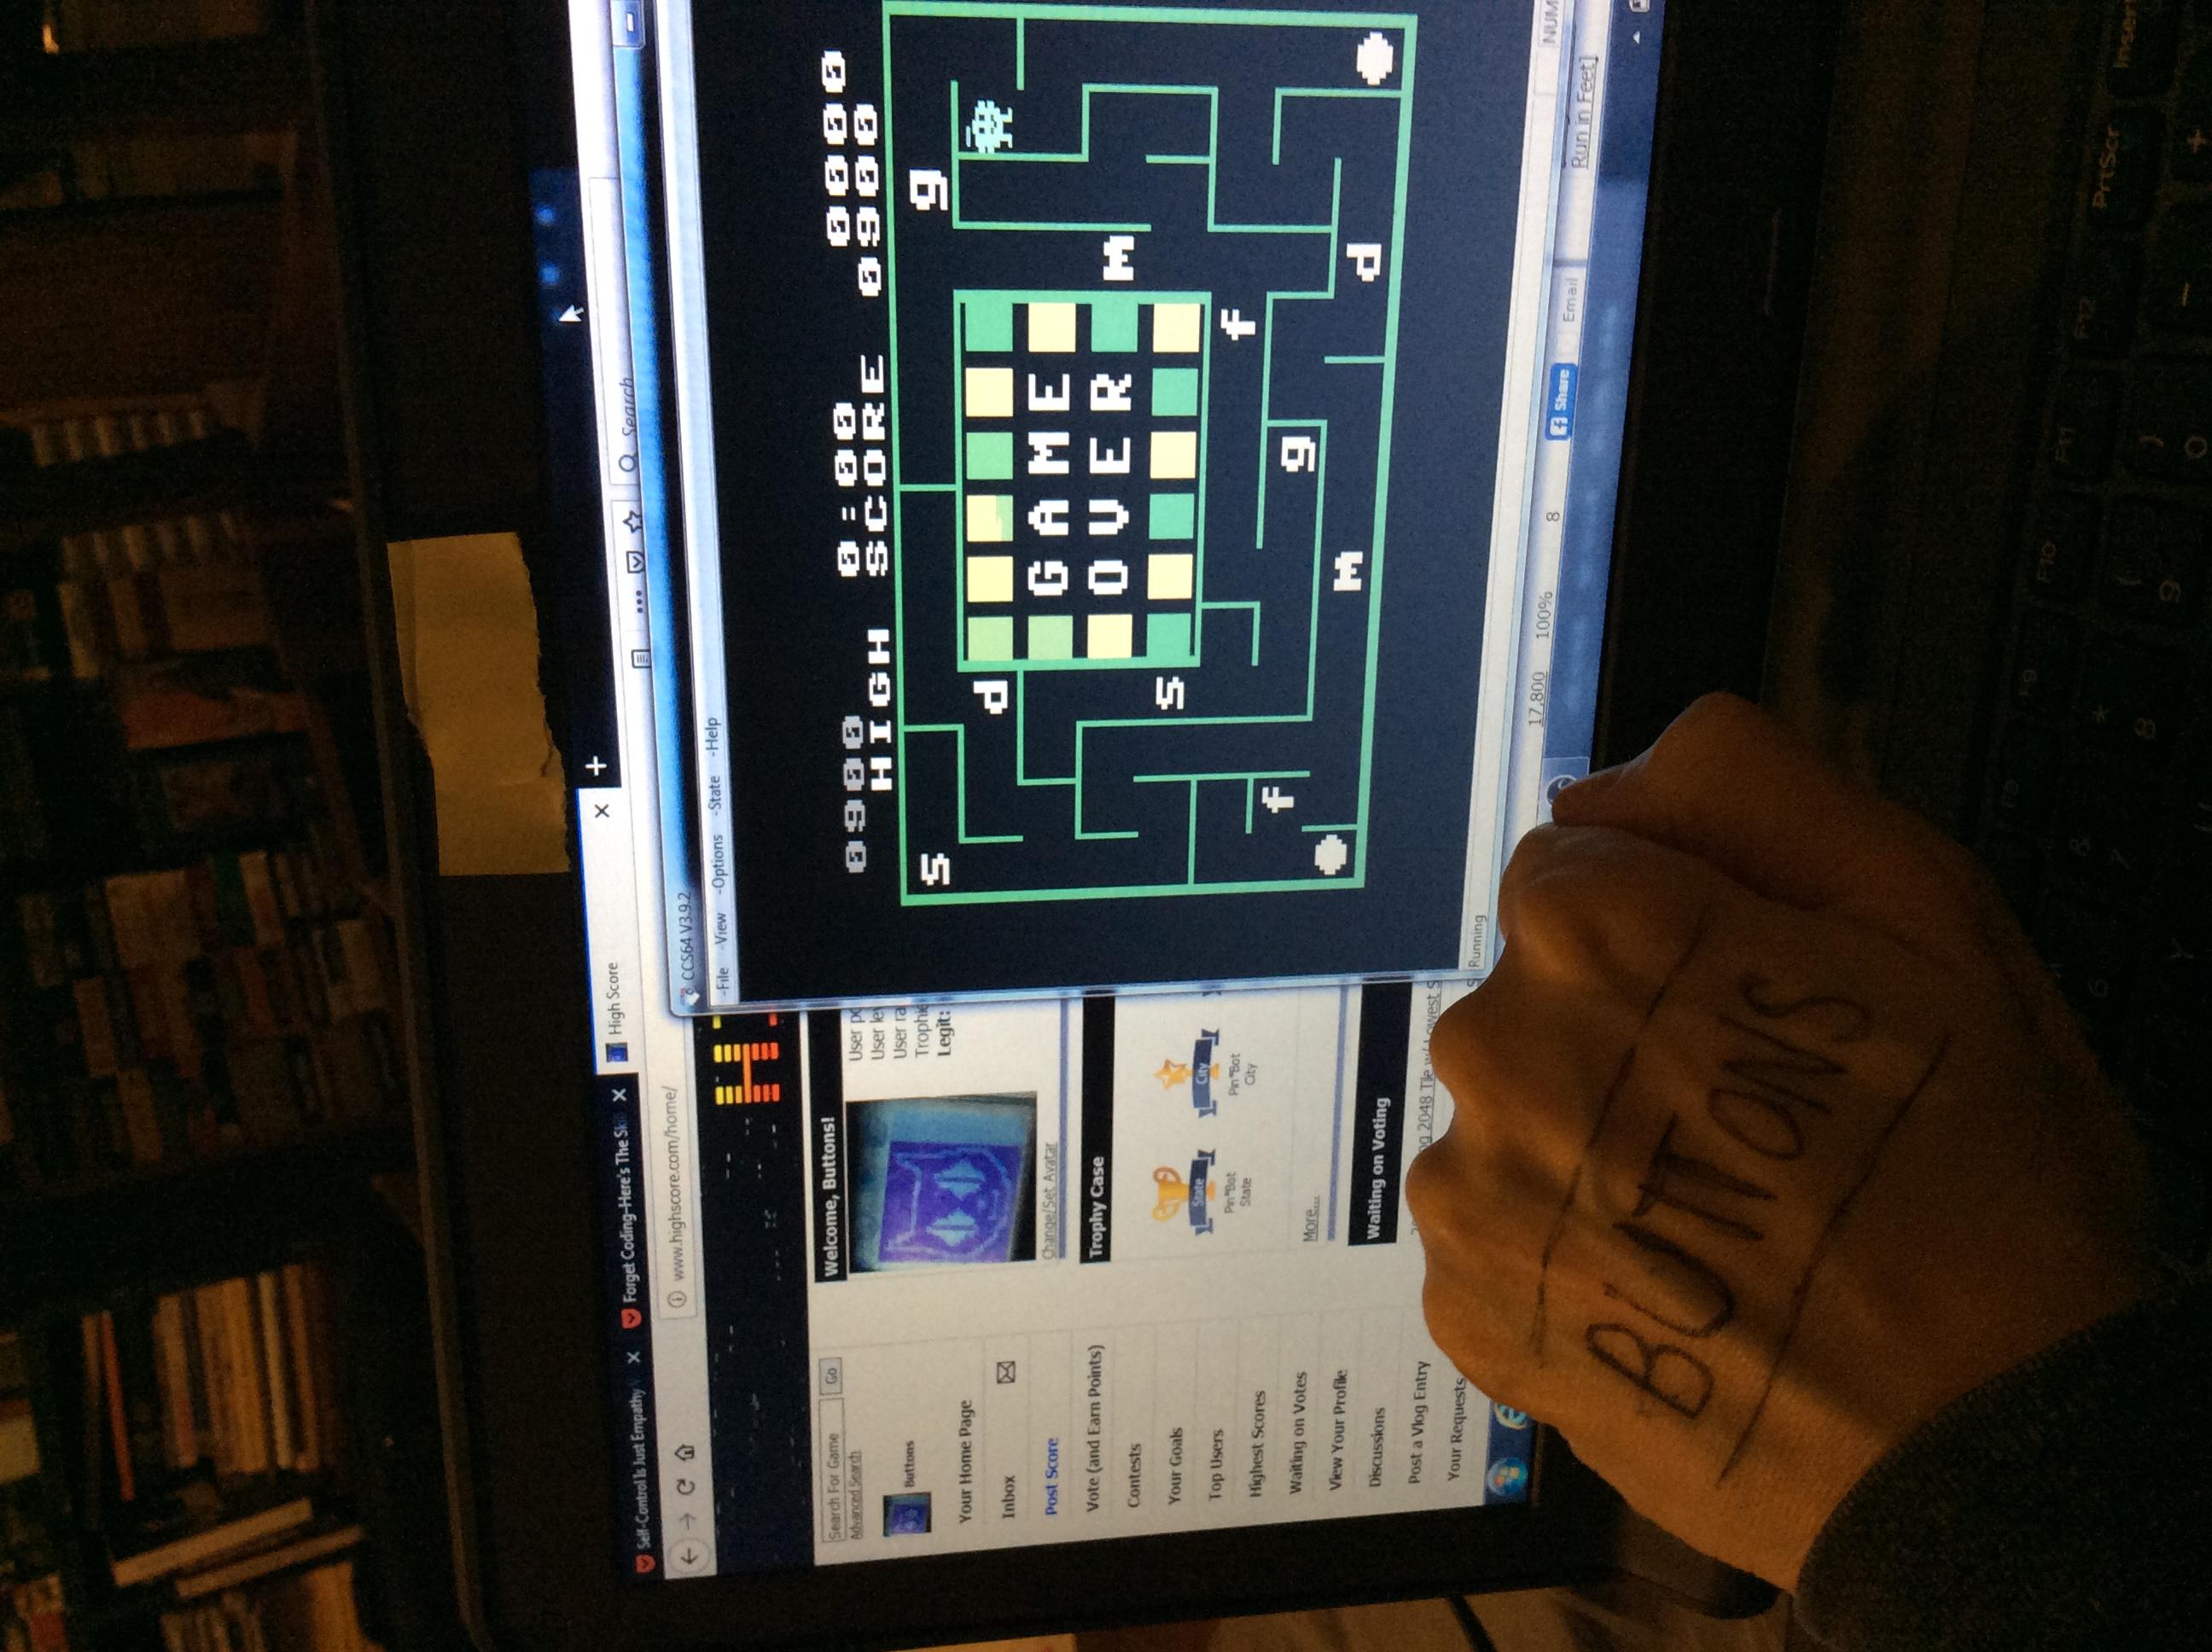 Alphabet Zoo [Level 1 / Game 1 / Lowercase] 900 points